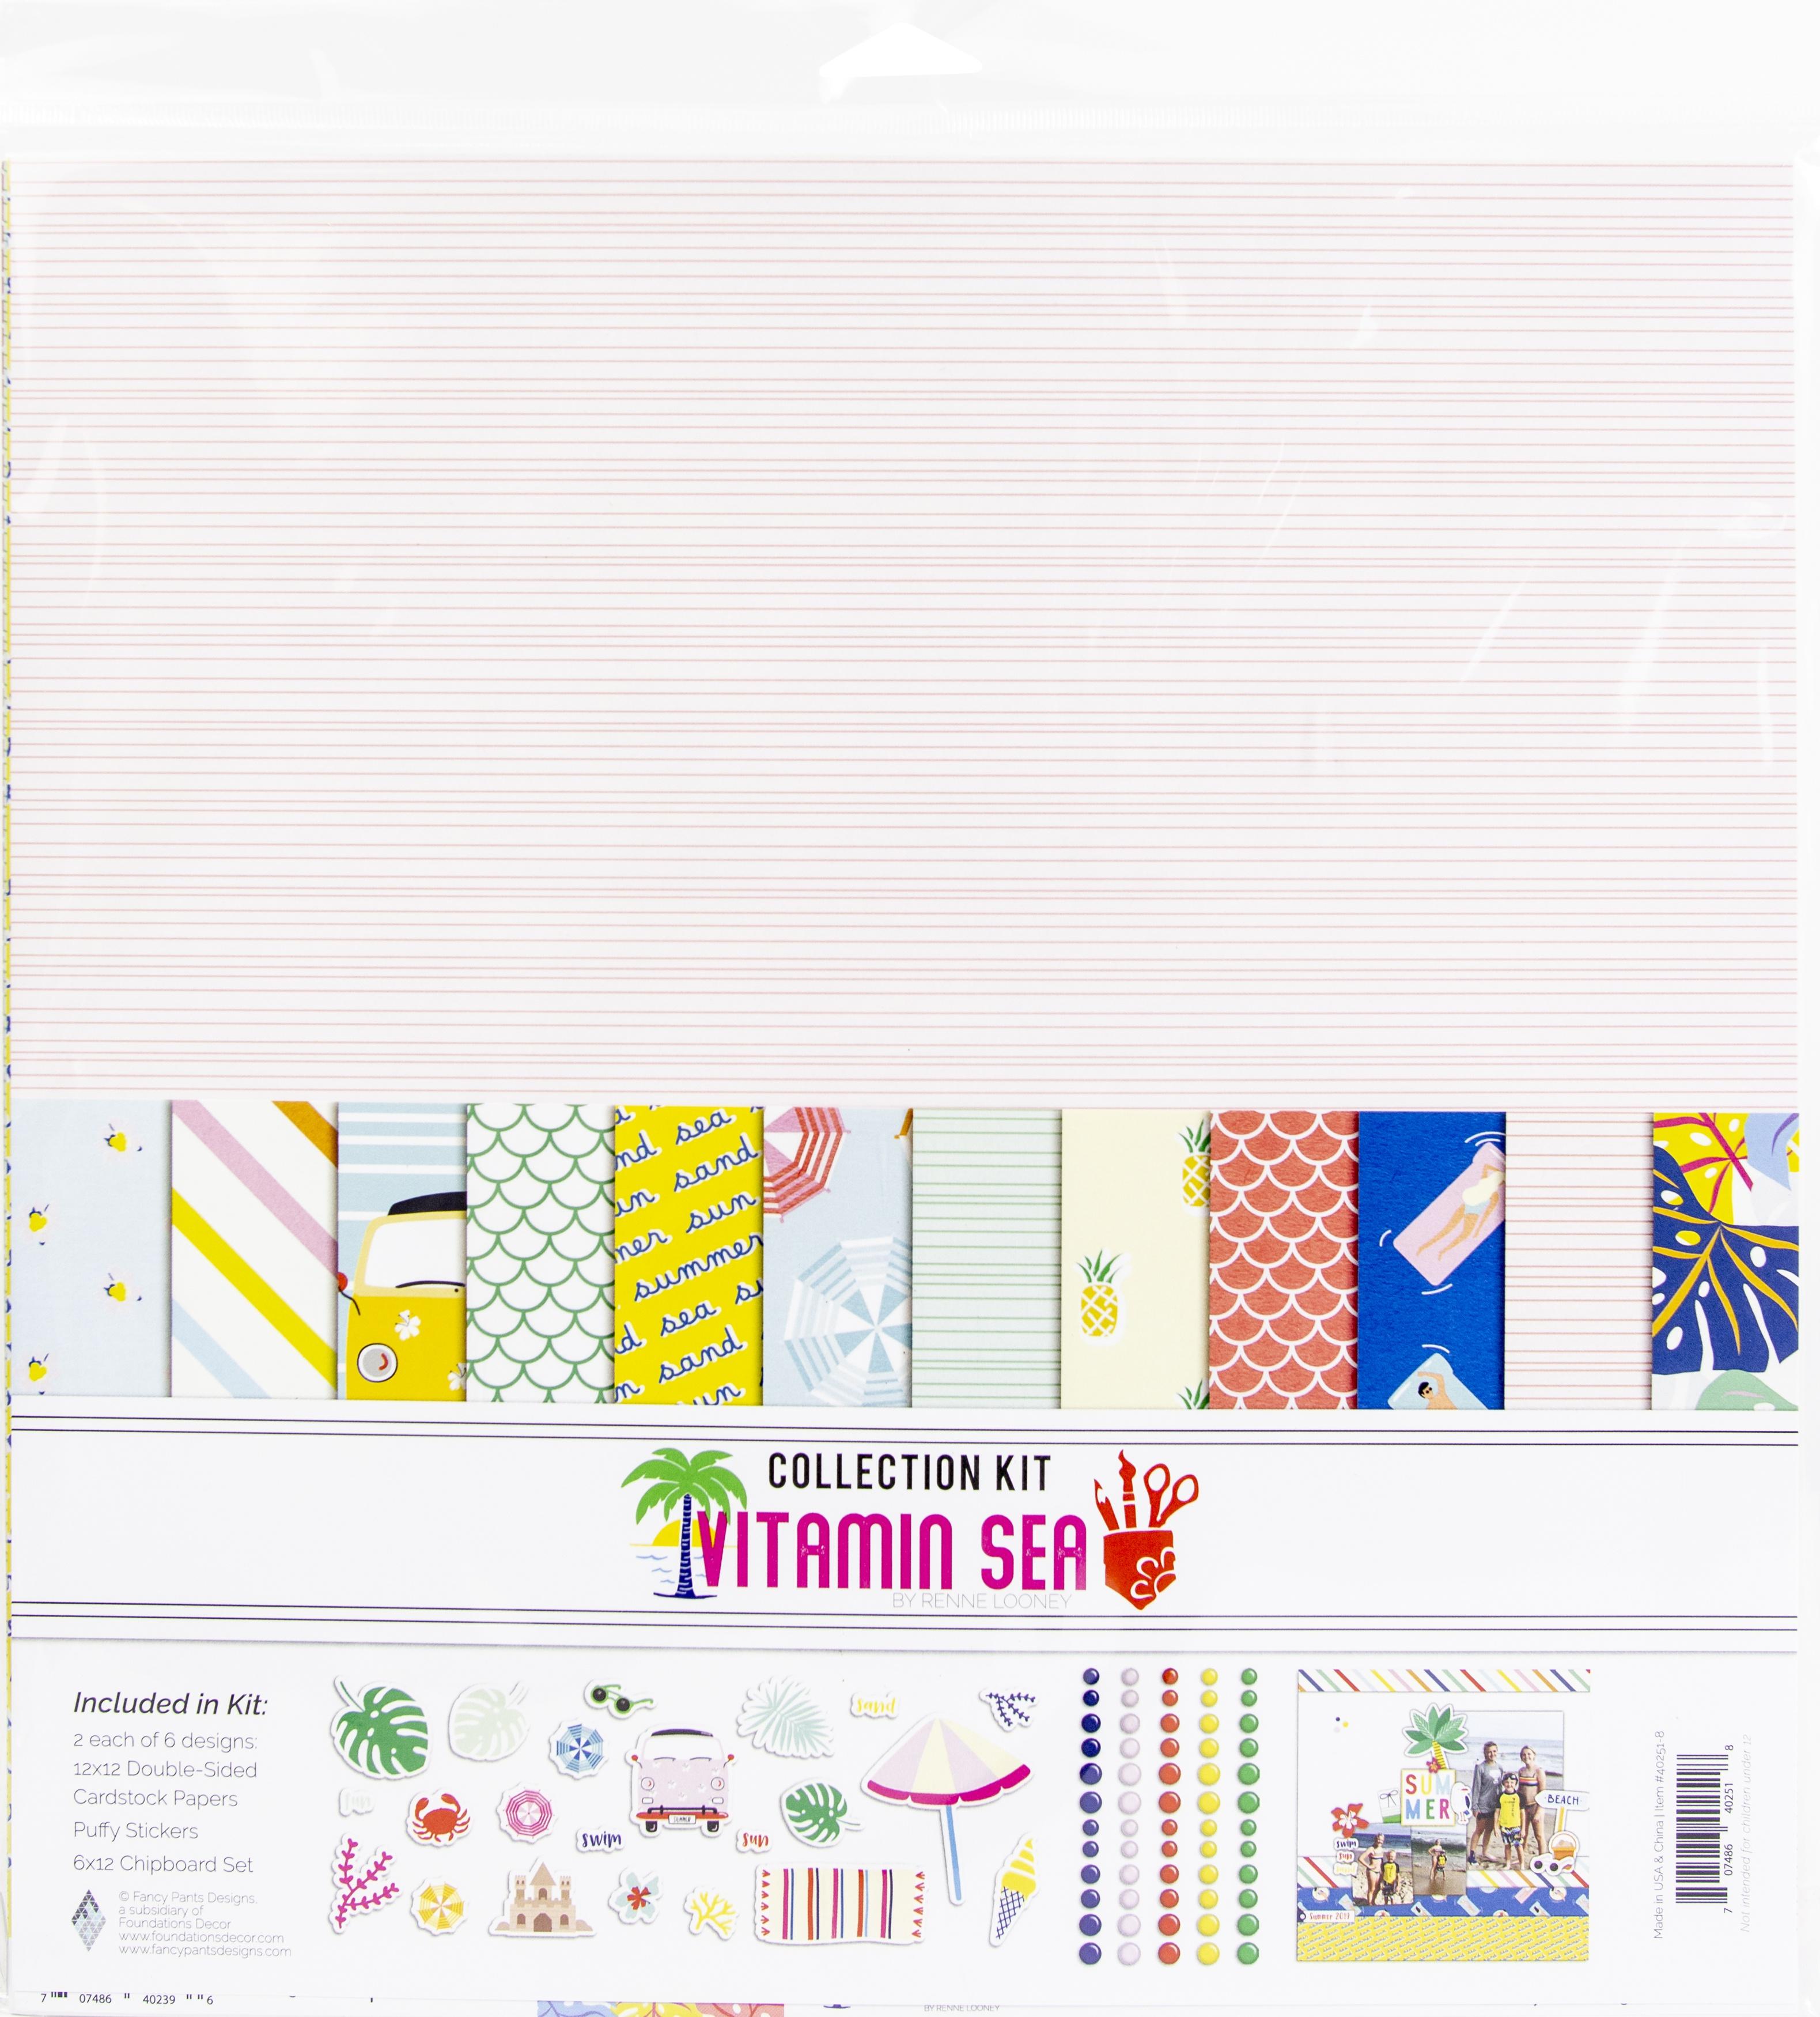 Fancy Pants Designs Collection Kit 12X12-Vitamin Sea